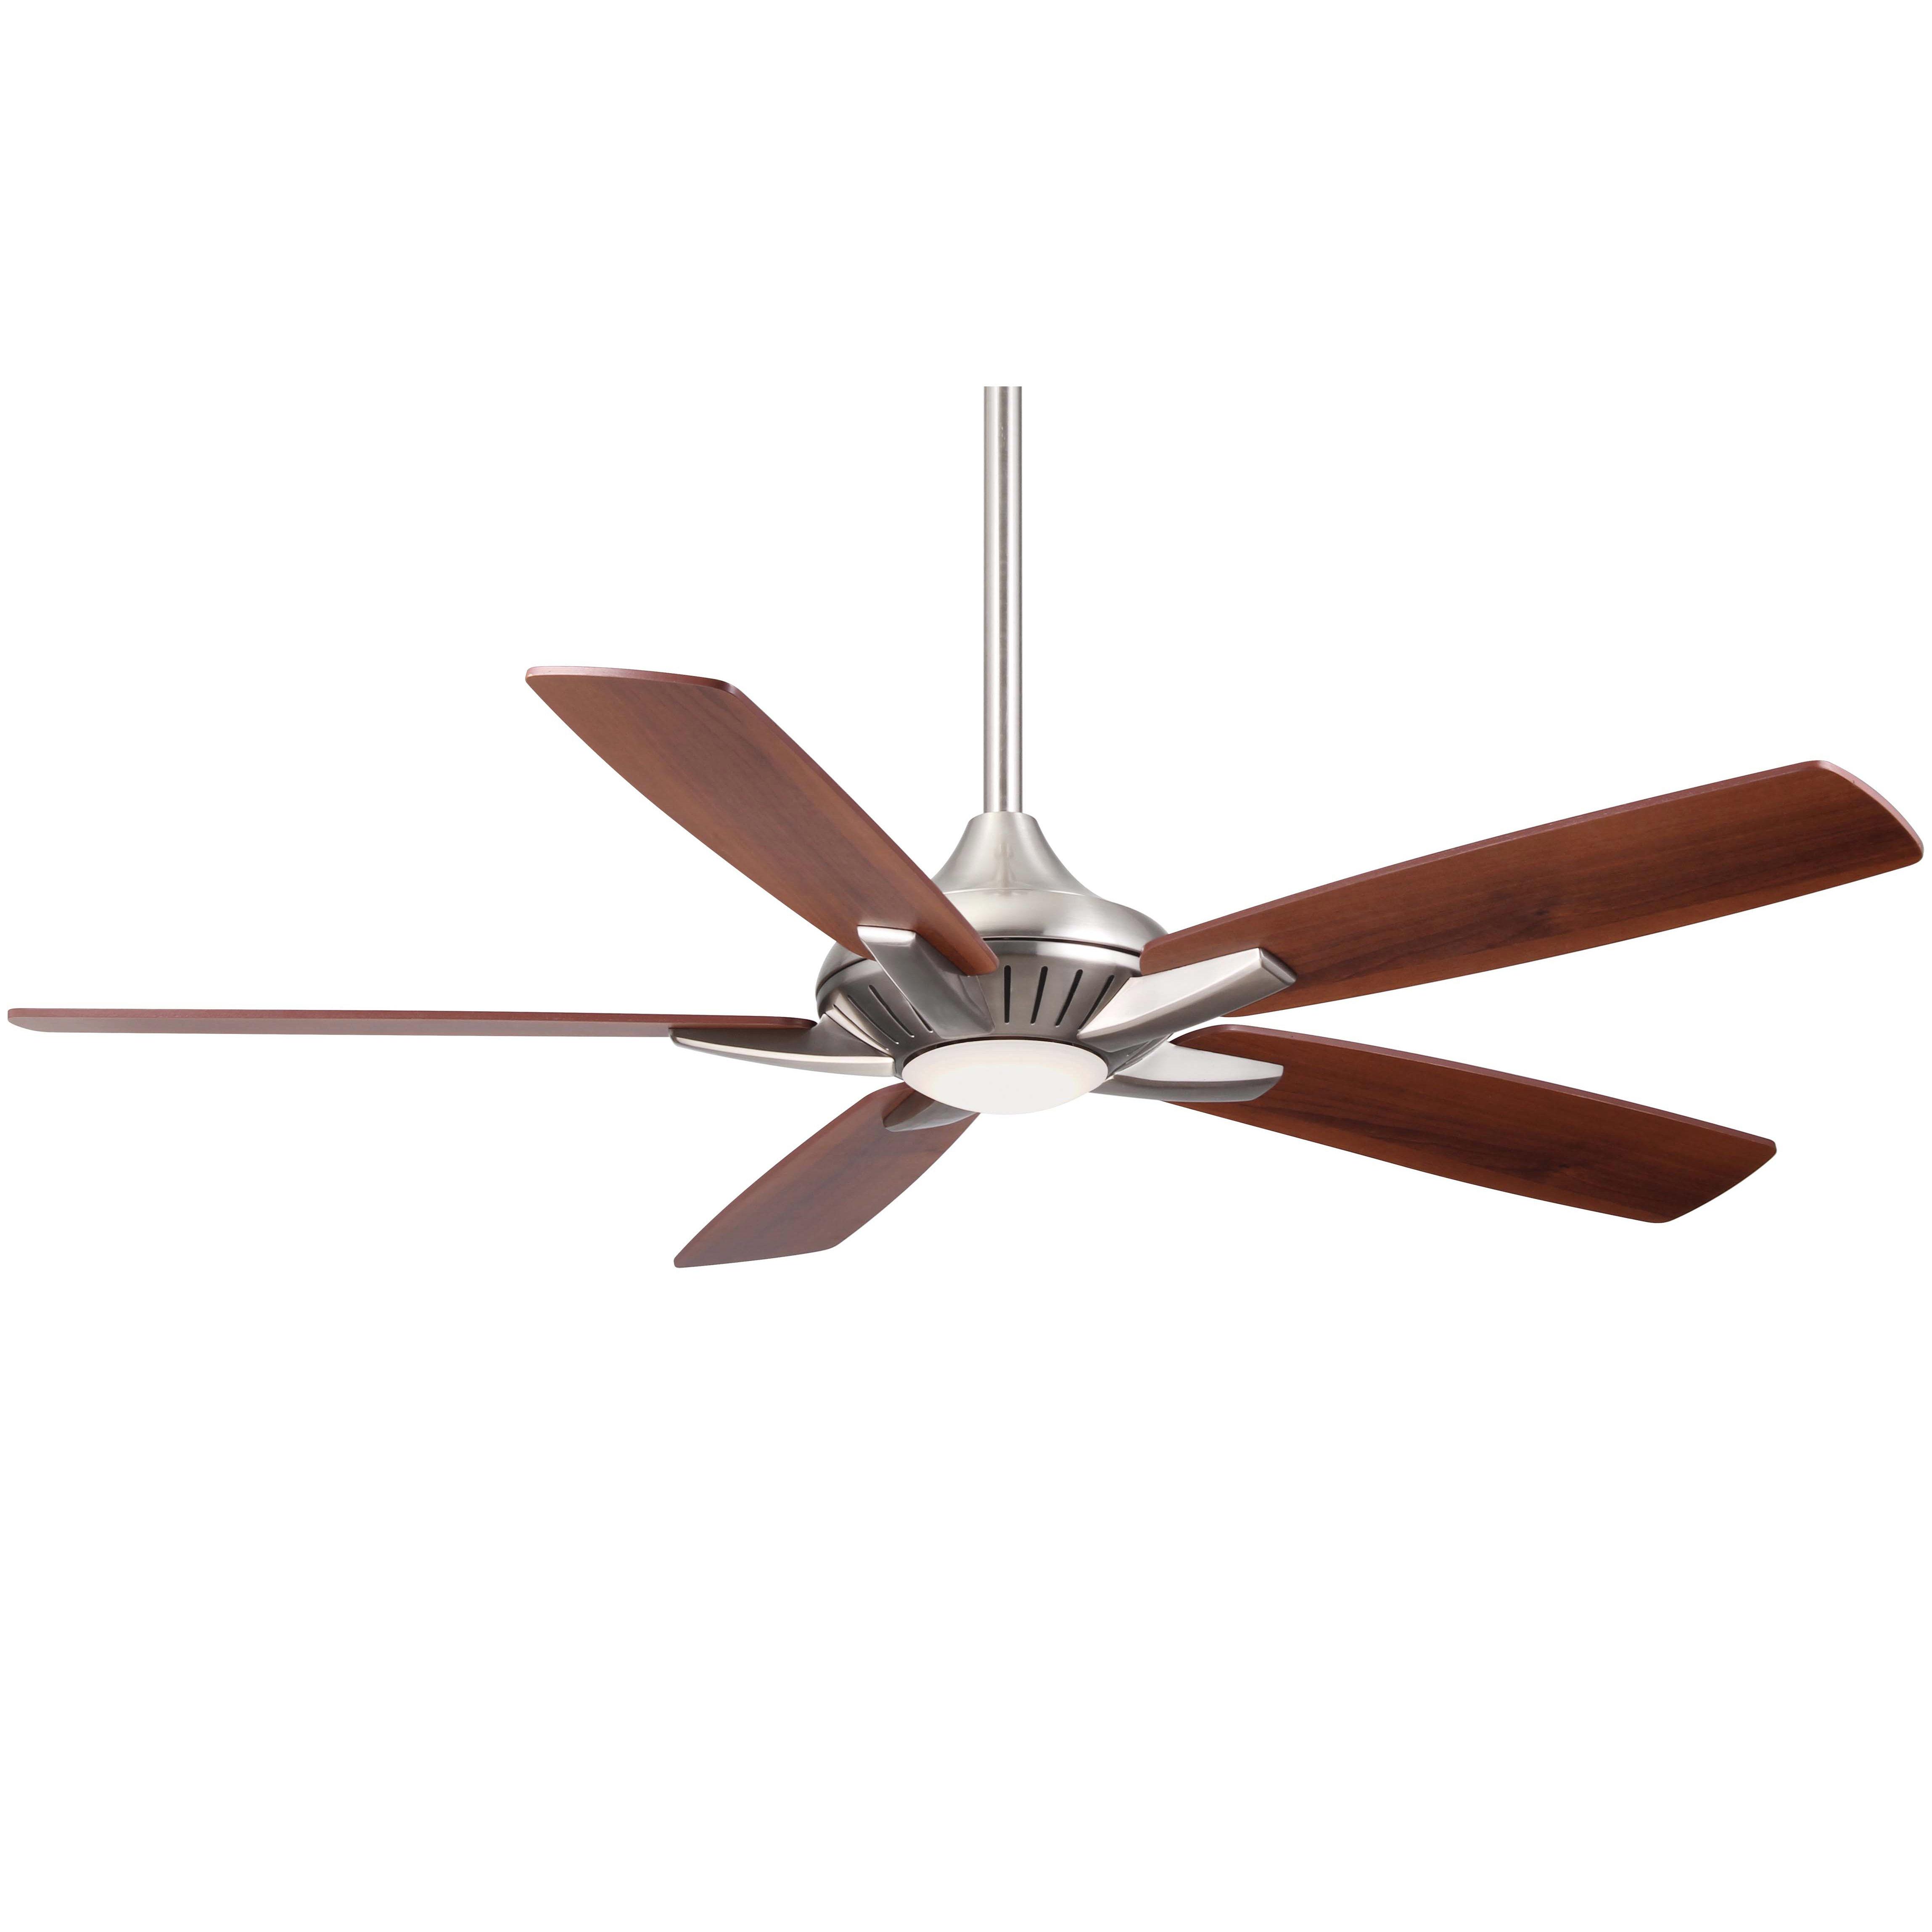 "MinkaAire F1000 BN Brushed Nickel 52"" 5 Blade Indoor Ceiling Fan"